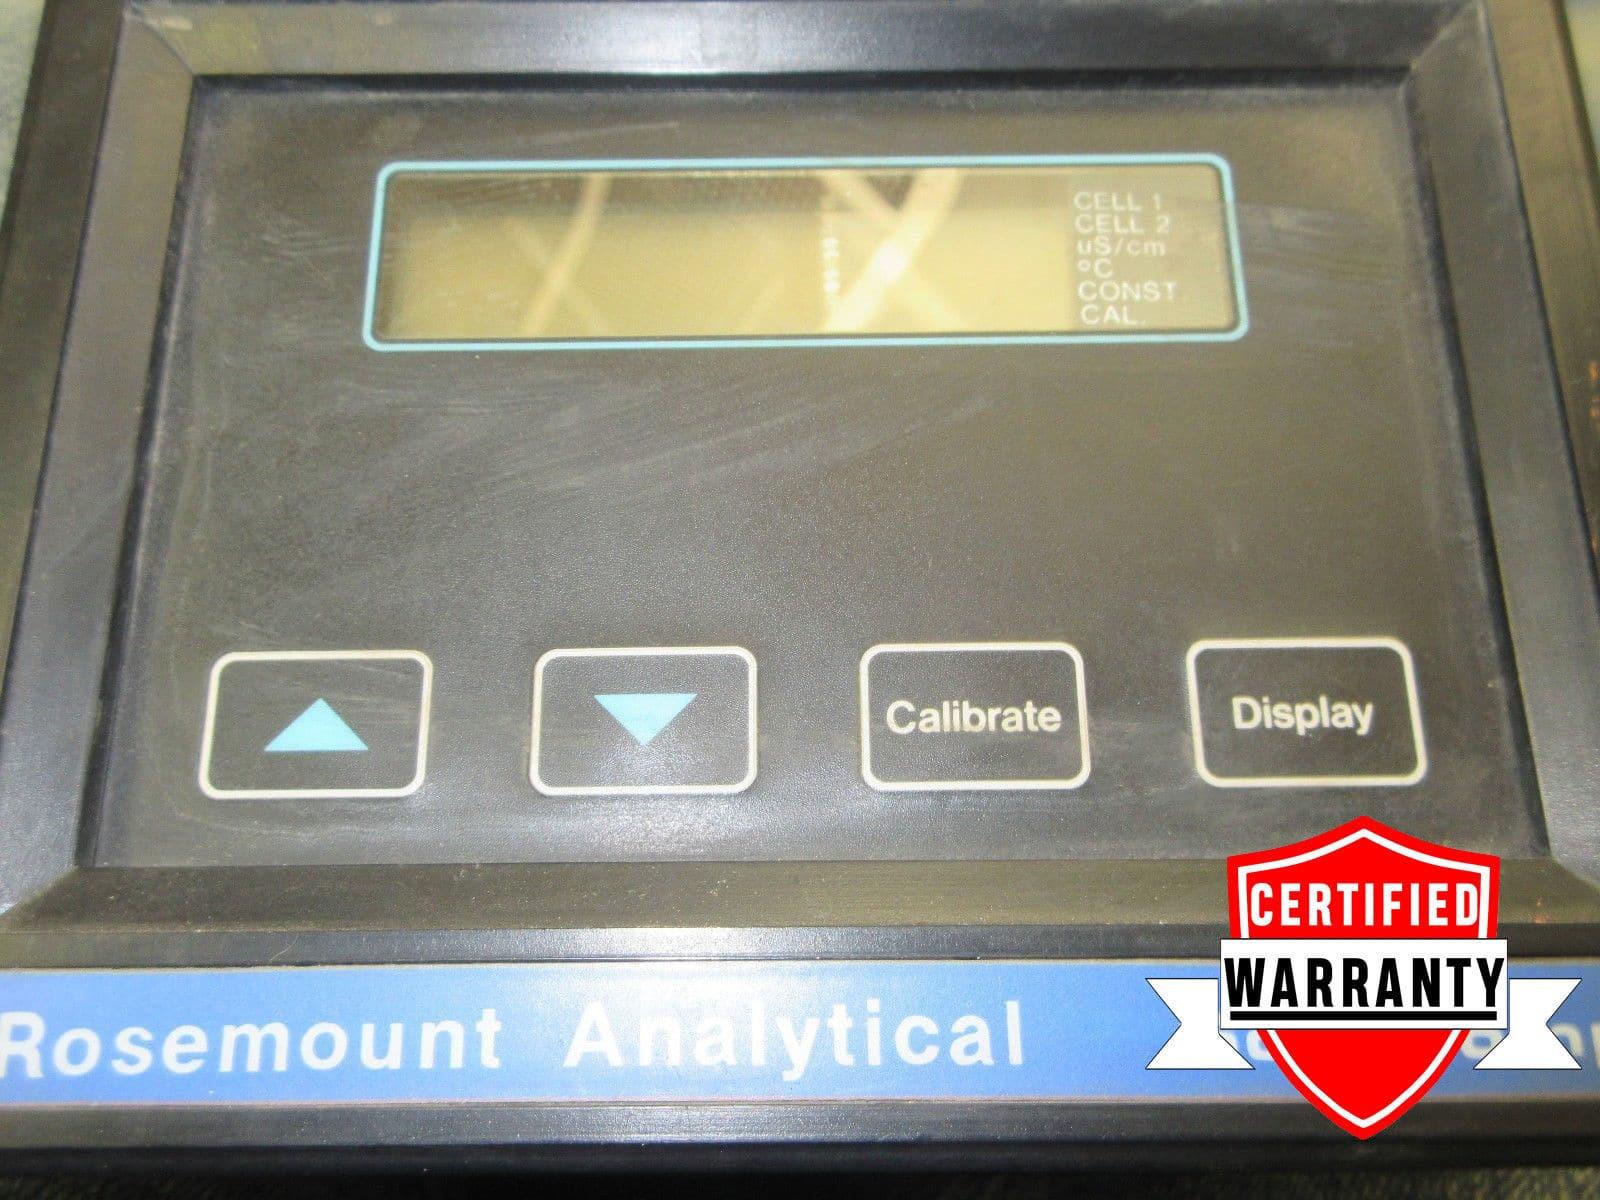 V2 GOOD ROSEMOUNT BECKMAN SOLU COMP WATER QUALITY ANALYZER SCL-C-002-M2